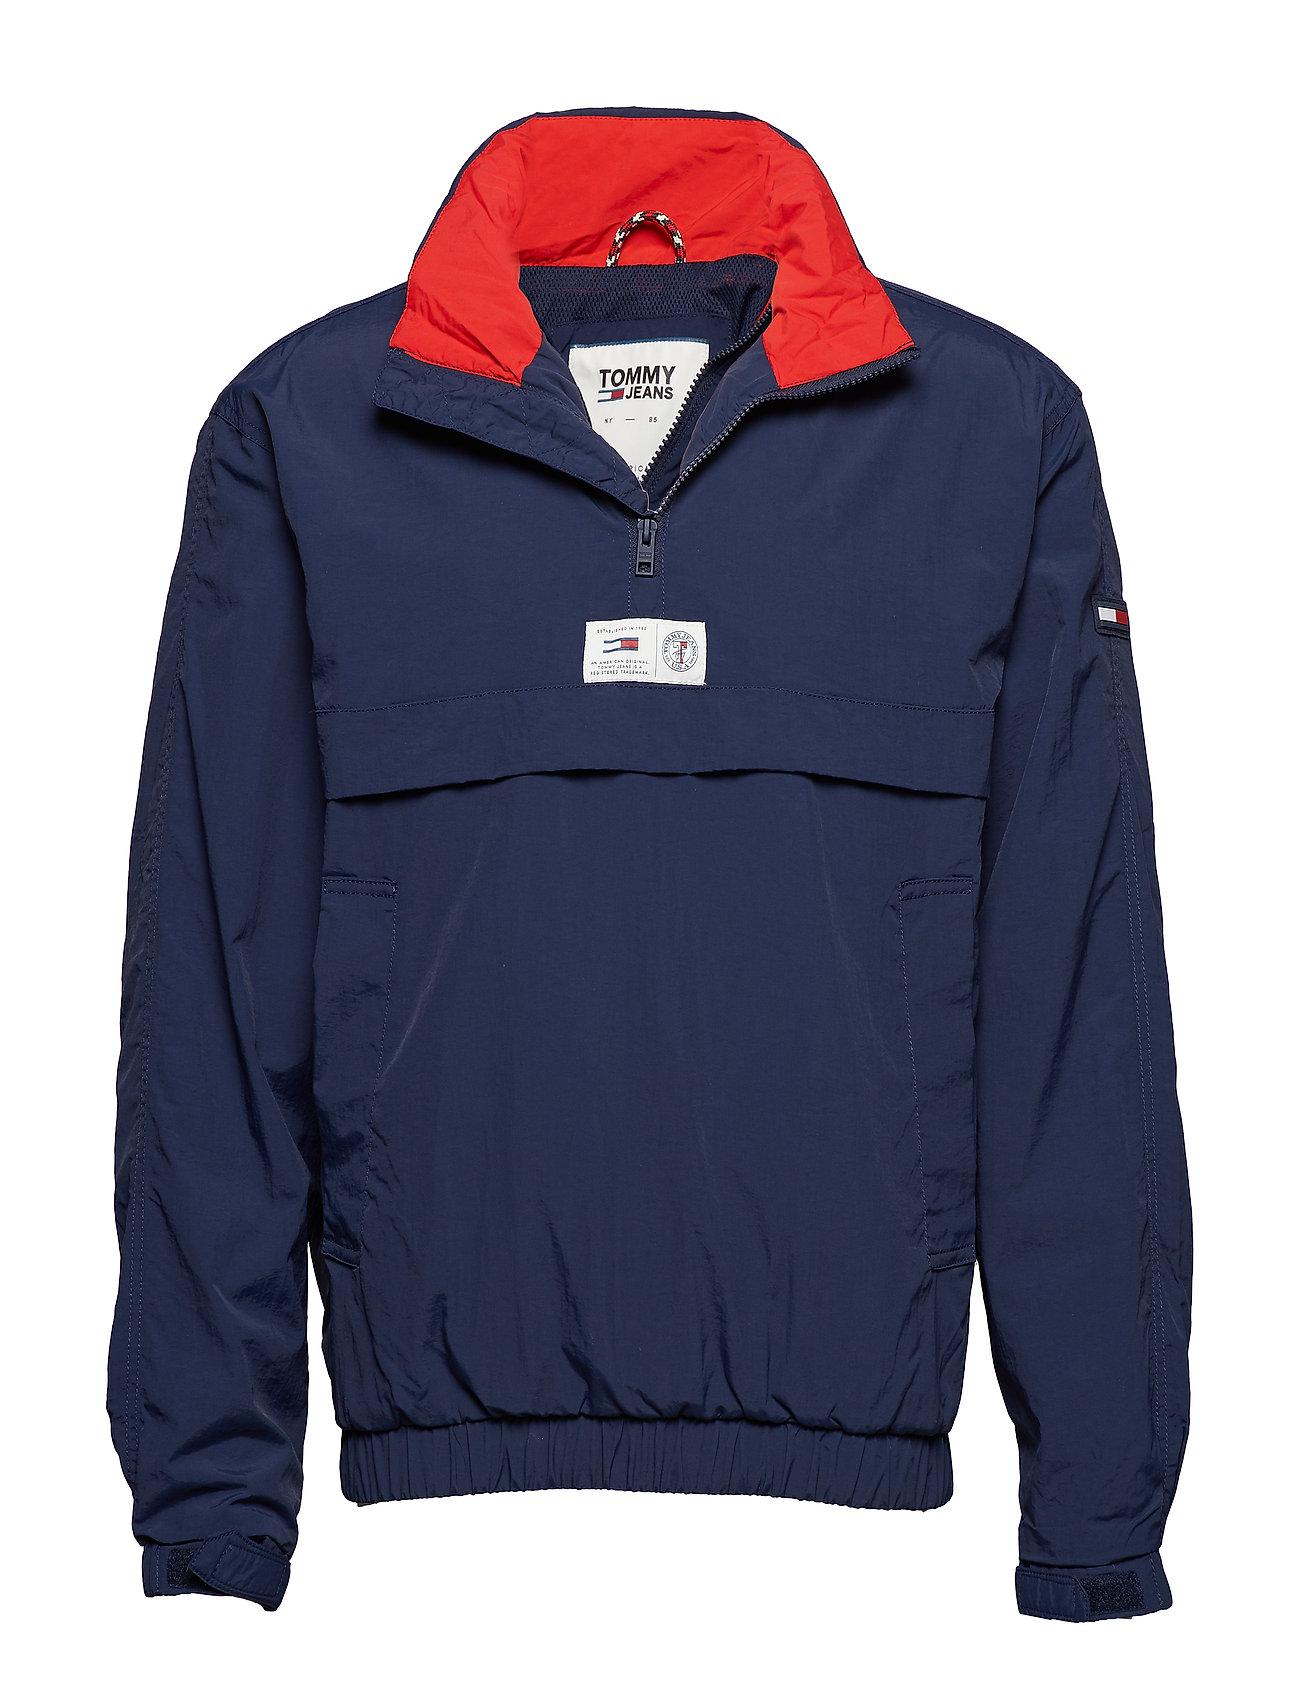 6eb9ea999 Tjm Popover Jacket (Black Iris) (149 €) - Tommy Jeans - | Boozt.com